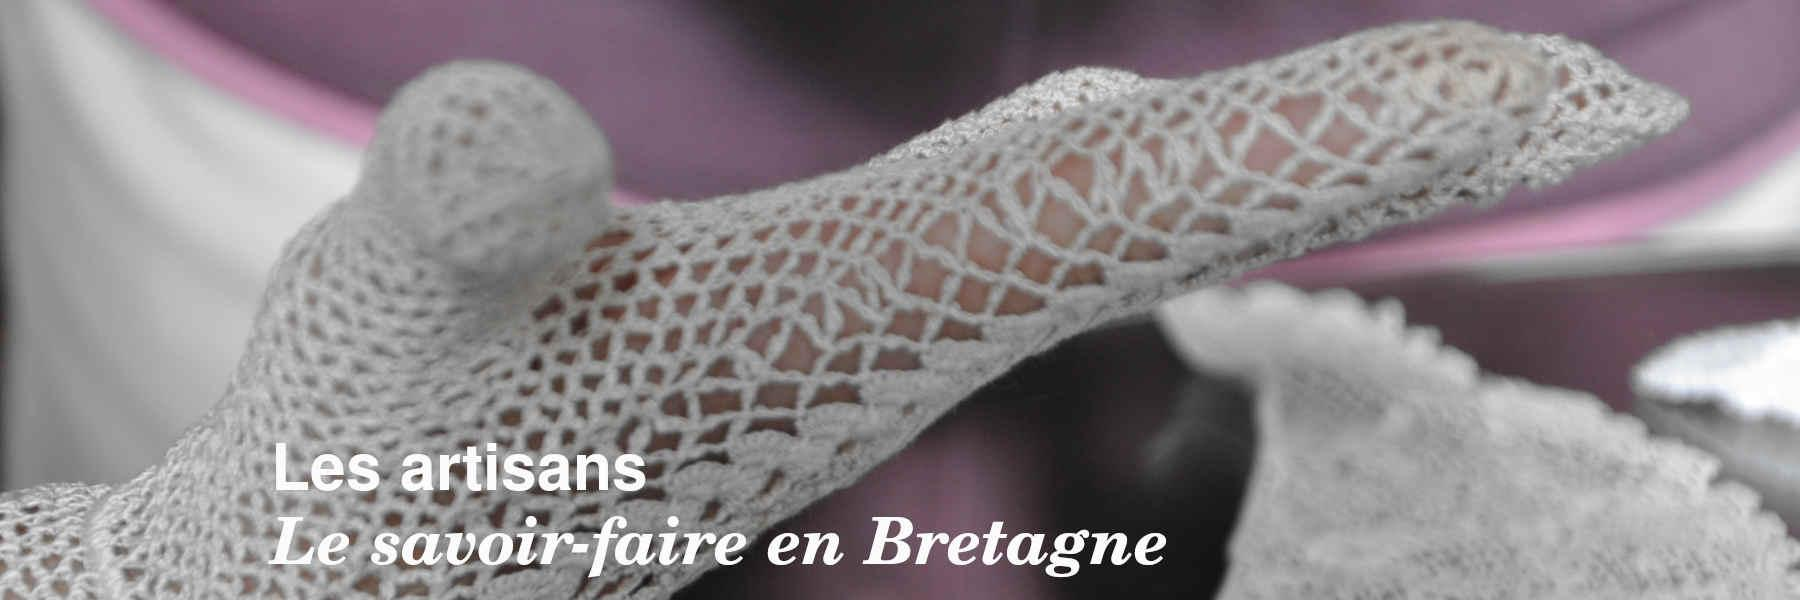 Les artisans en Bretagne